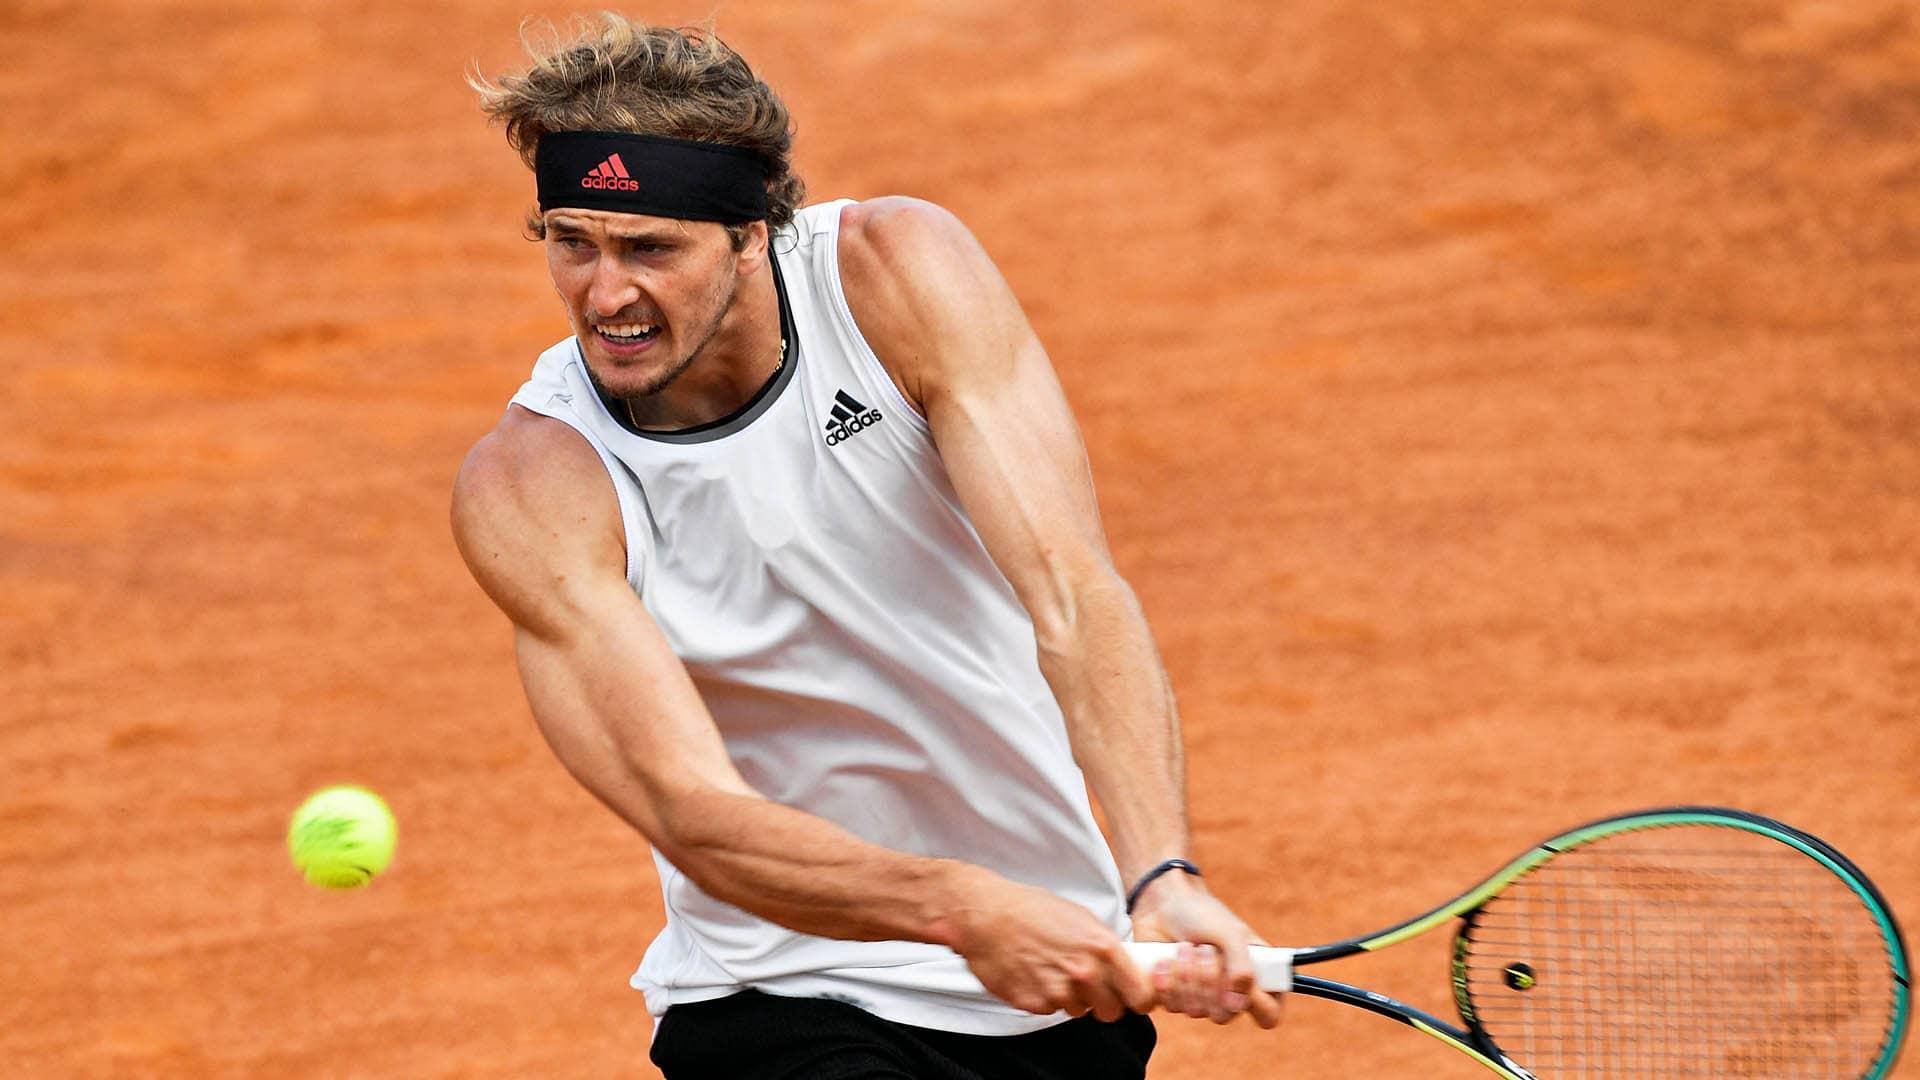 Rome Open 2021: Alexander Zverev vs. Kei Nishikori Tennis Pick and Prediction